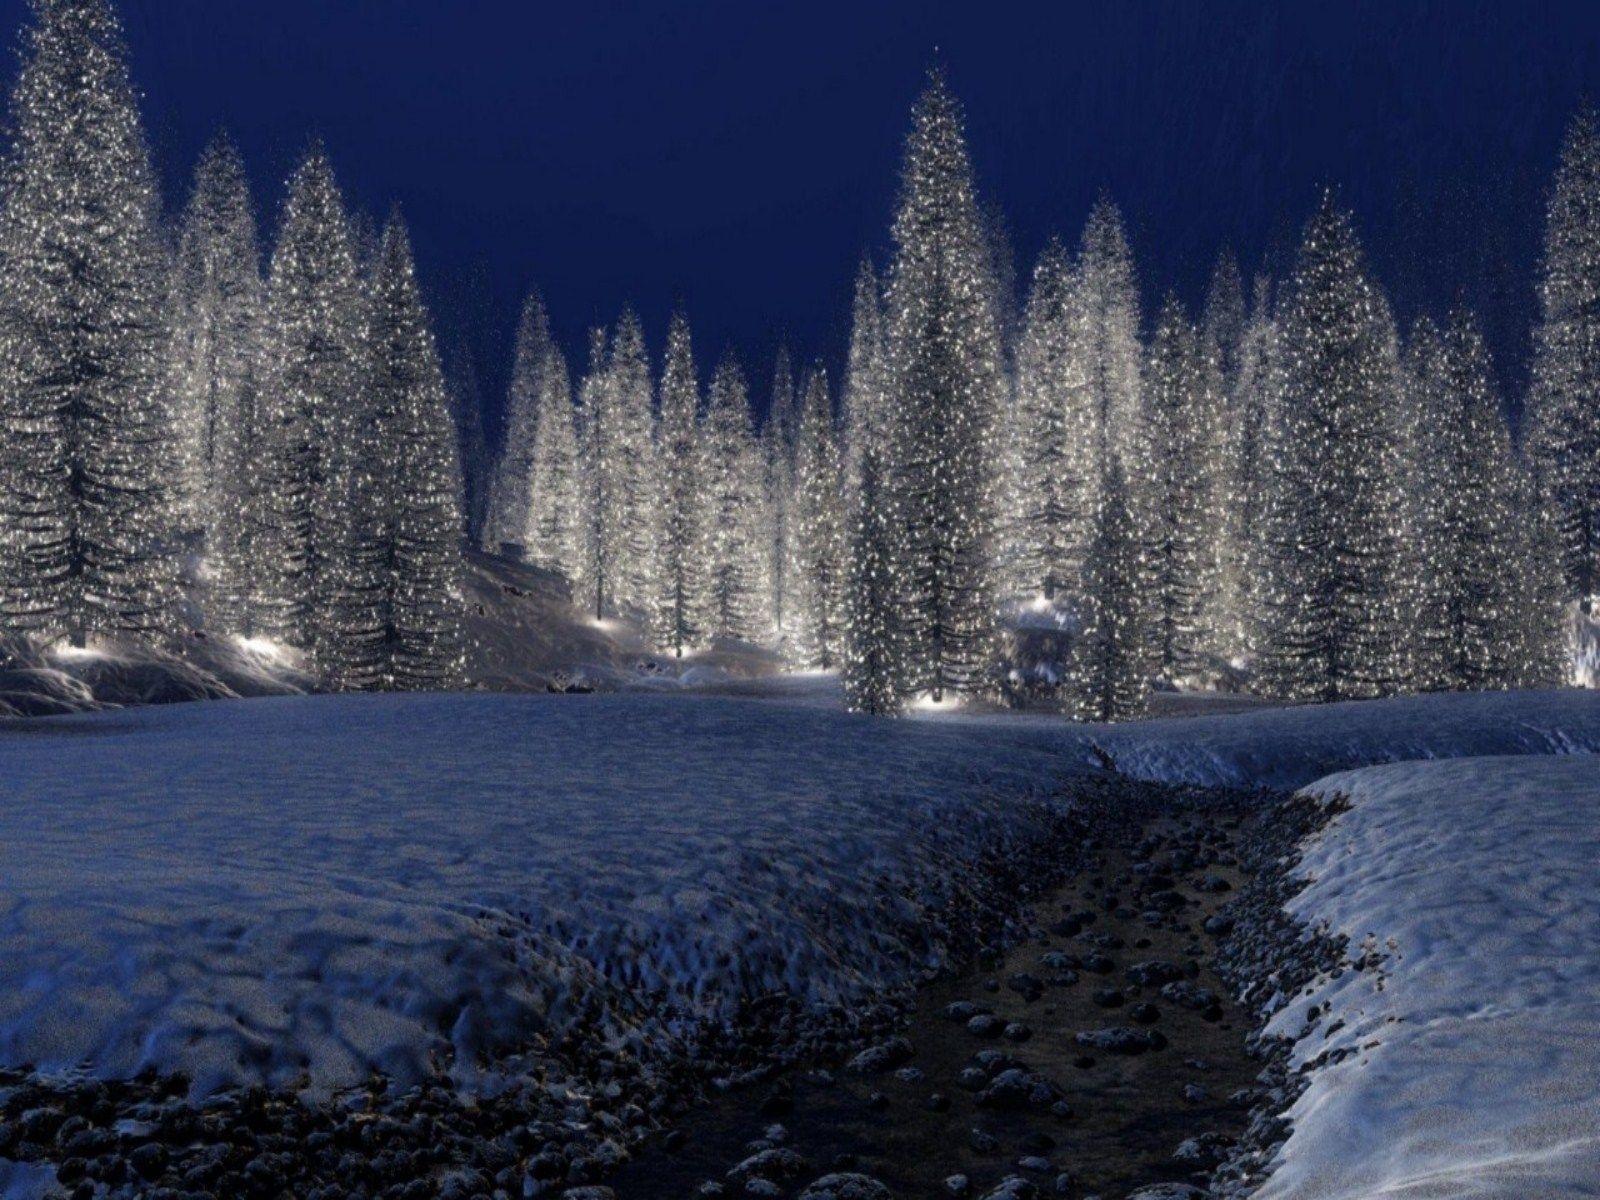 christmas scenery | free download hd snowy christmas scene wallpaper